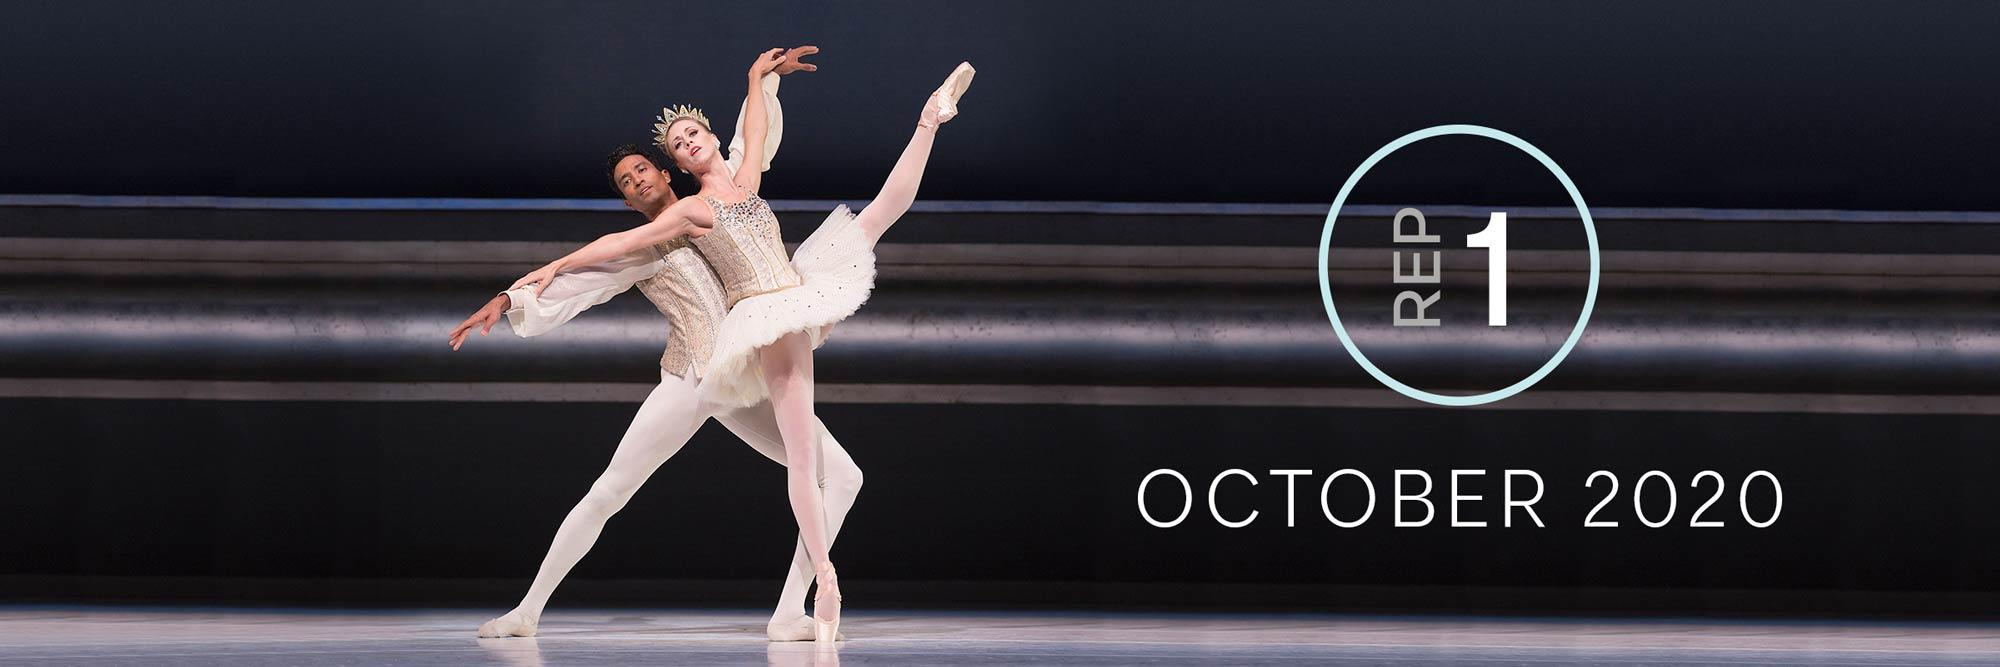 Rep 1, October 2020: Lesley Rausch and Karel Cruz dancing in George Balanchine's Jewels.